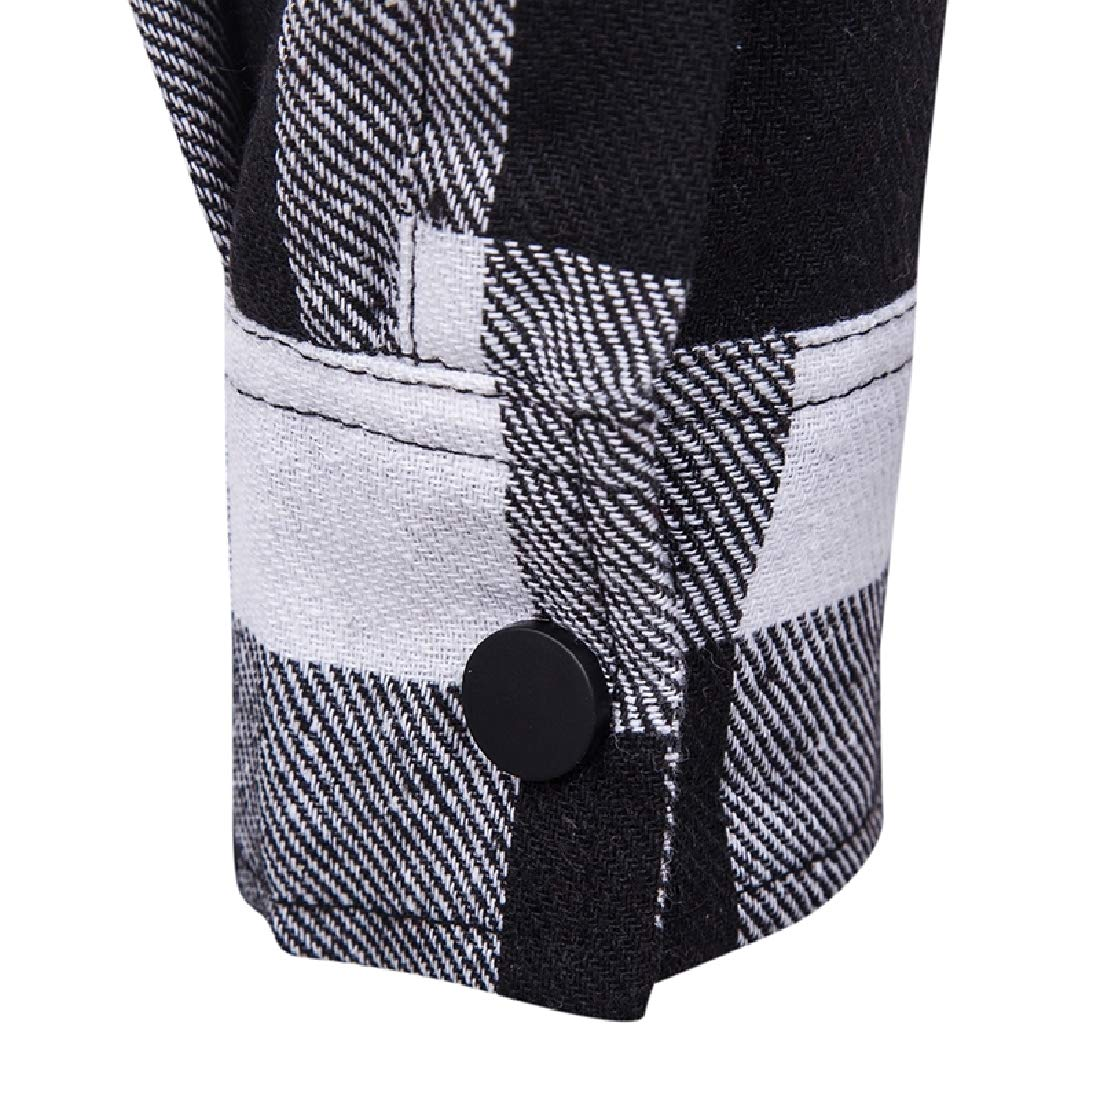 Aooword Mens Hooded Denim Grid Tops Simple Graceful Casual Shirt